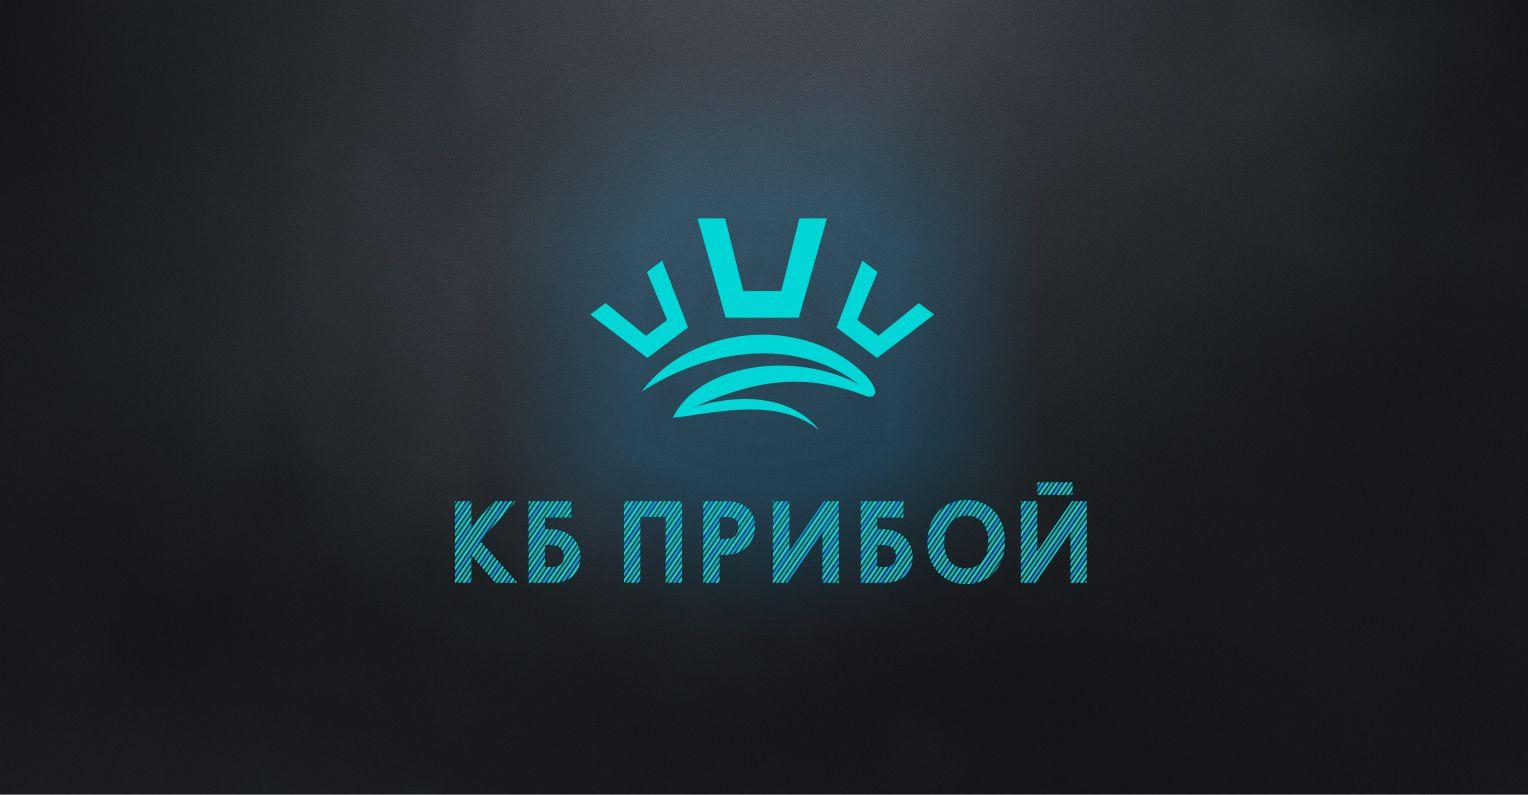 Разработка логотипа и фирменного стиля для КБ Прибой фото f_1075b2a2506acb05.jpg